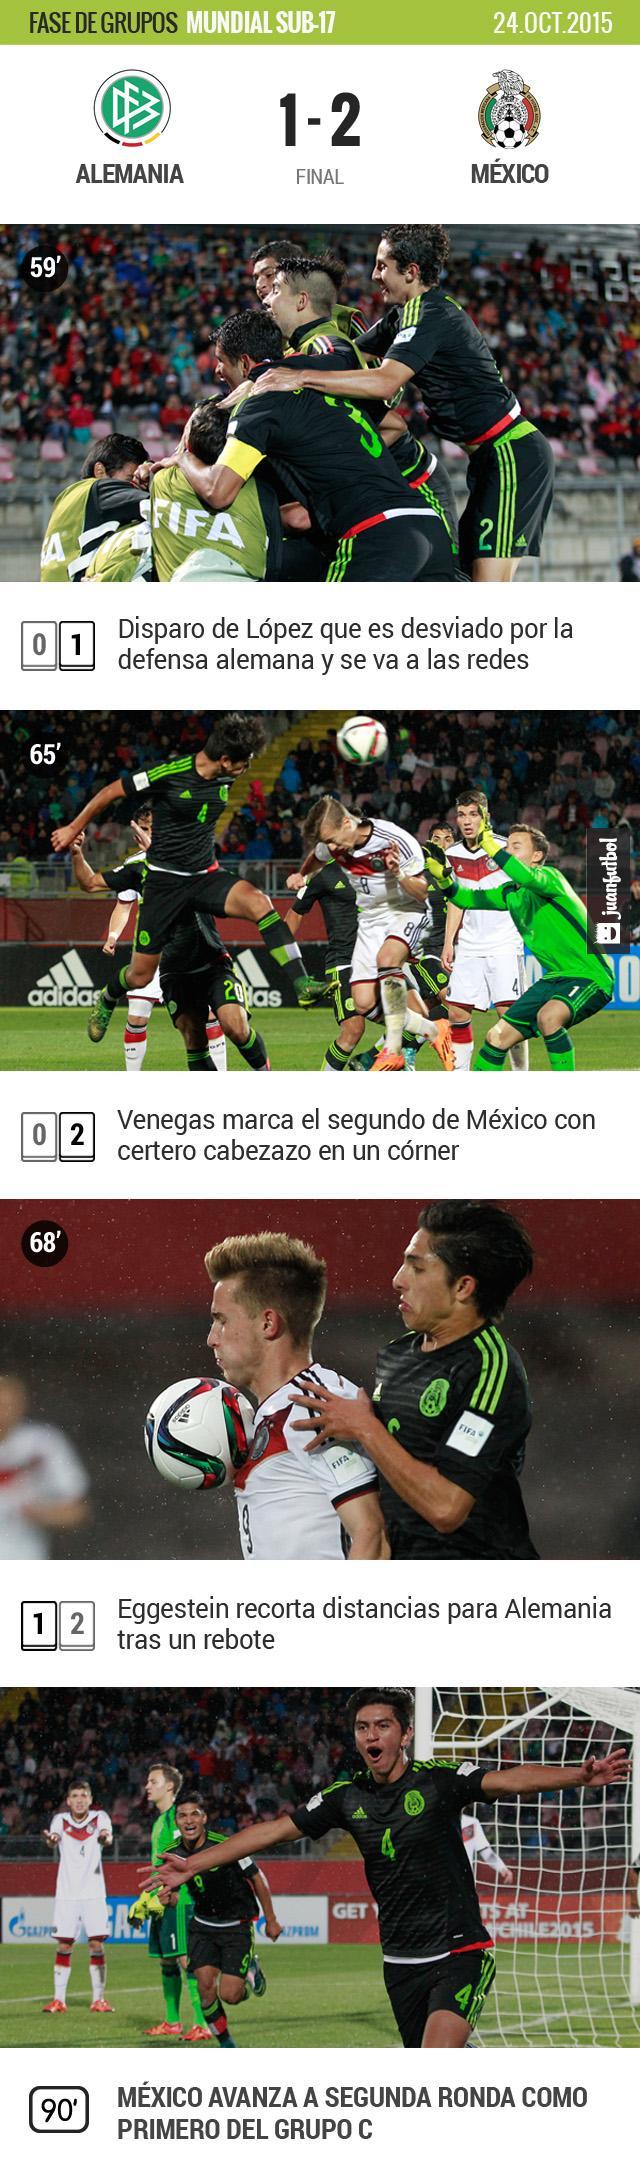 México venció 2-1 a Alemania en el cierre del Grupo C del Mundial Sub-17